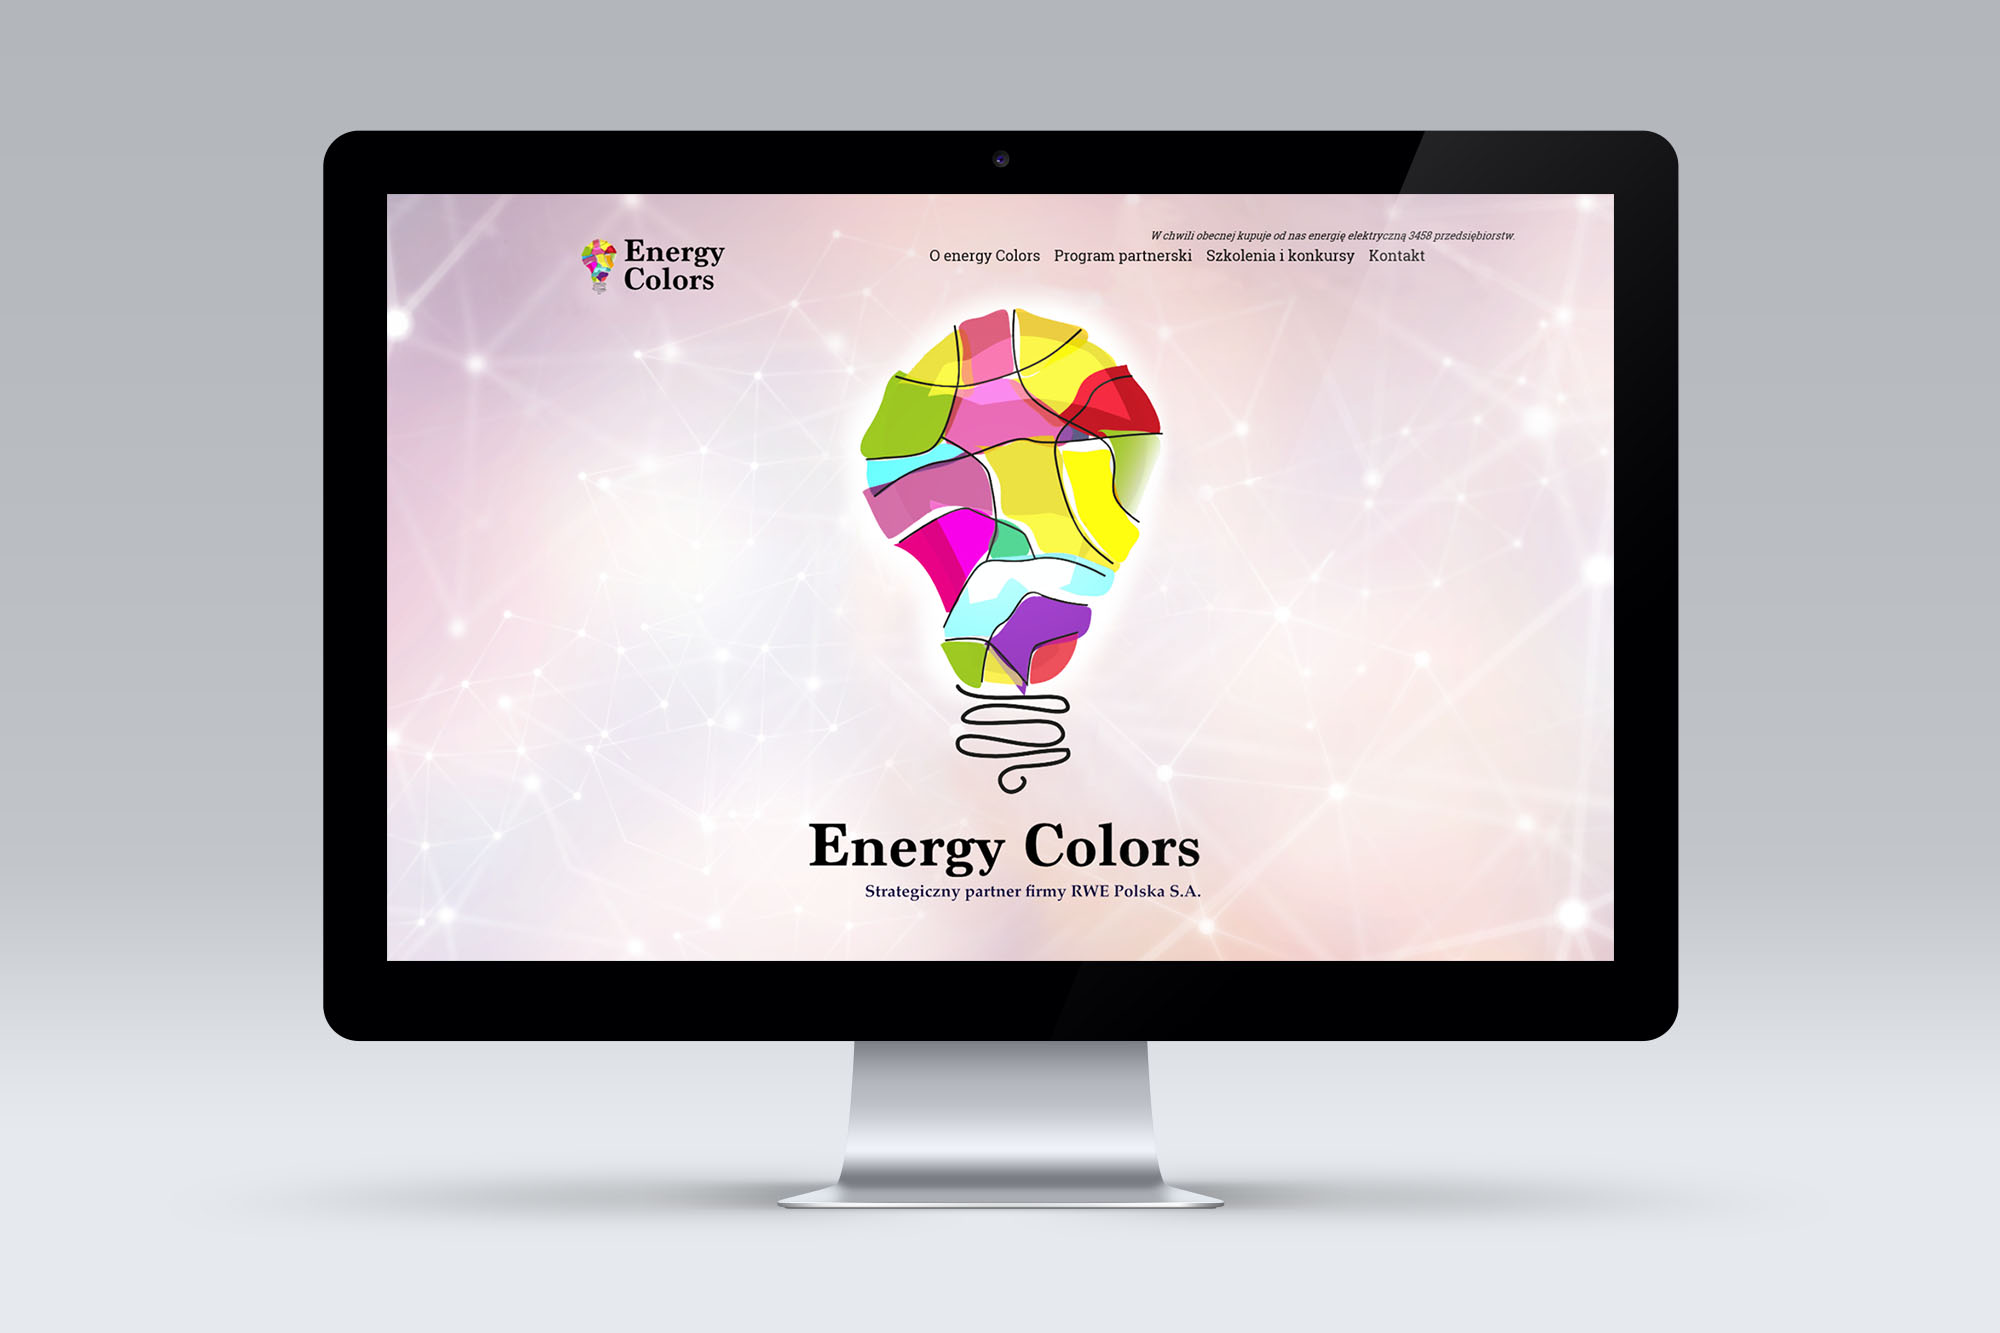 energycolors